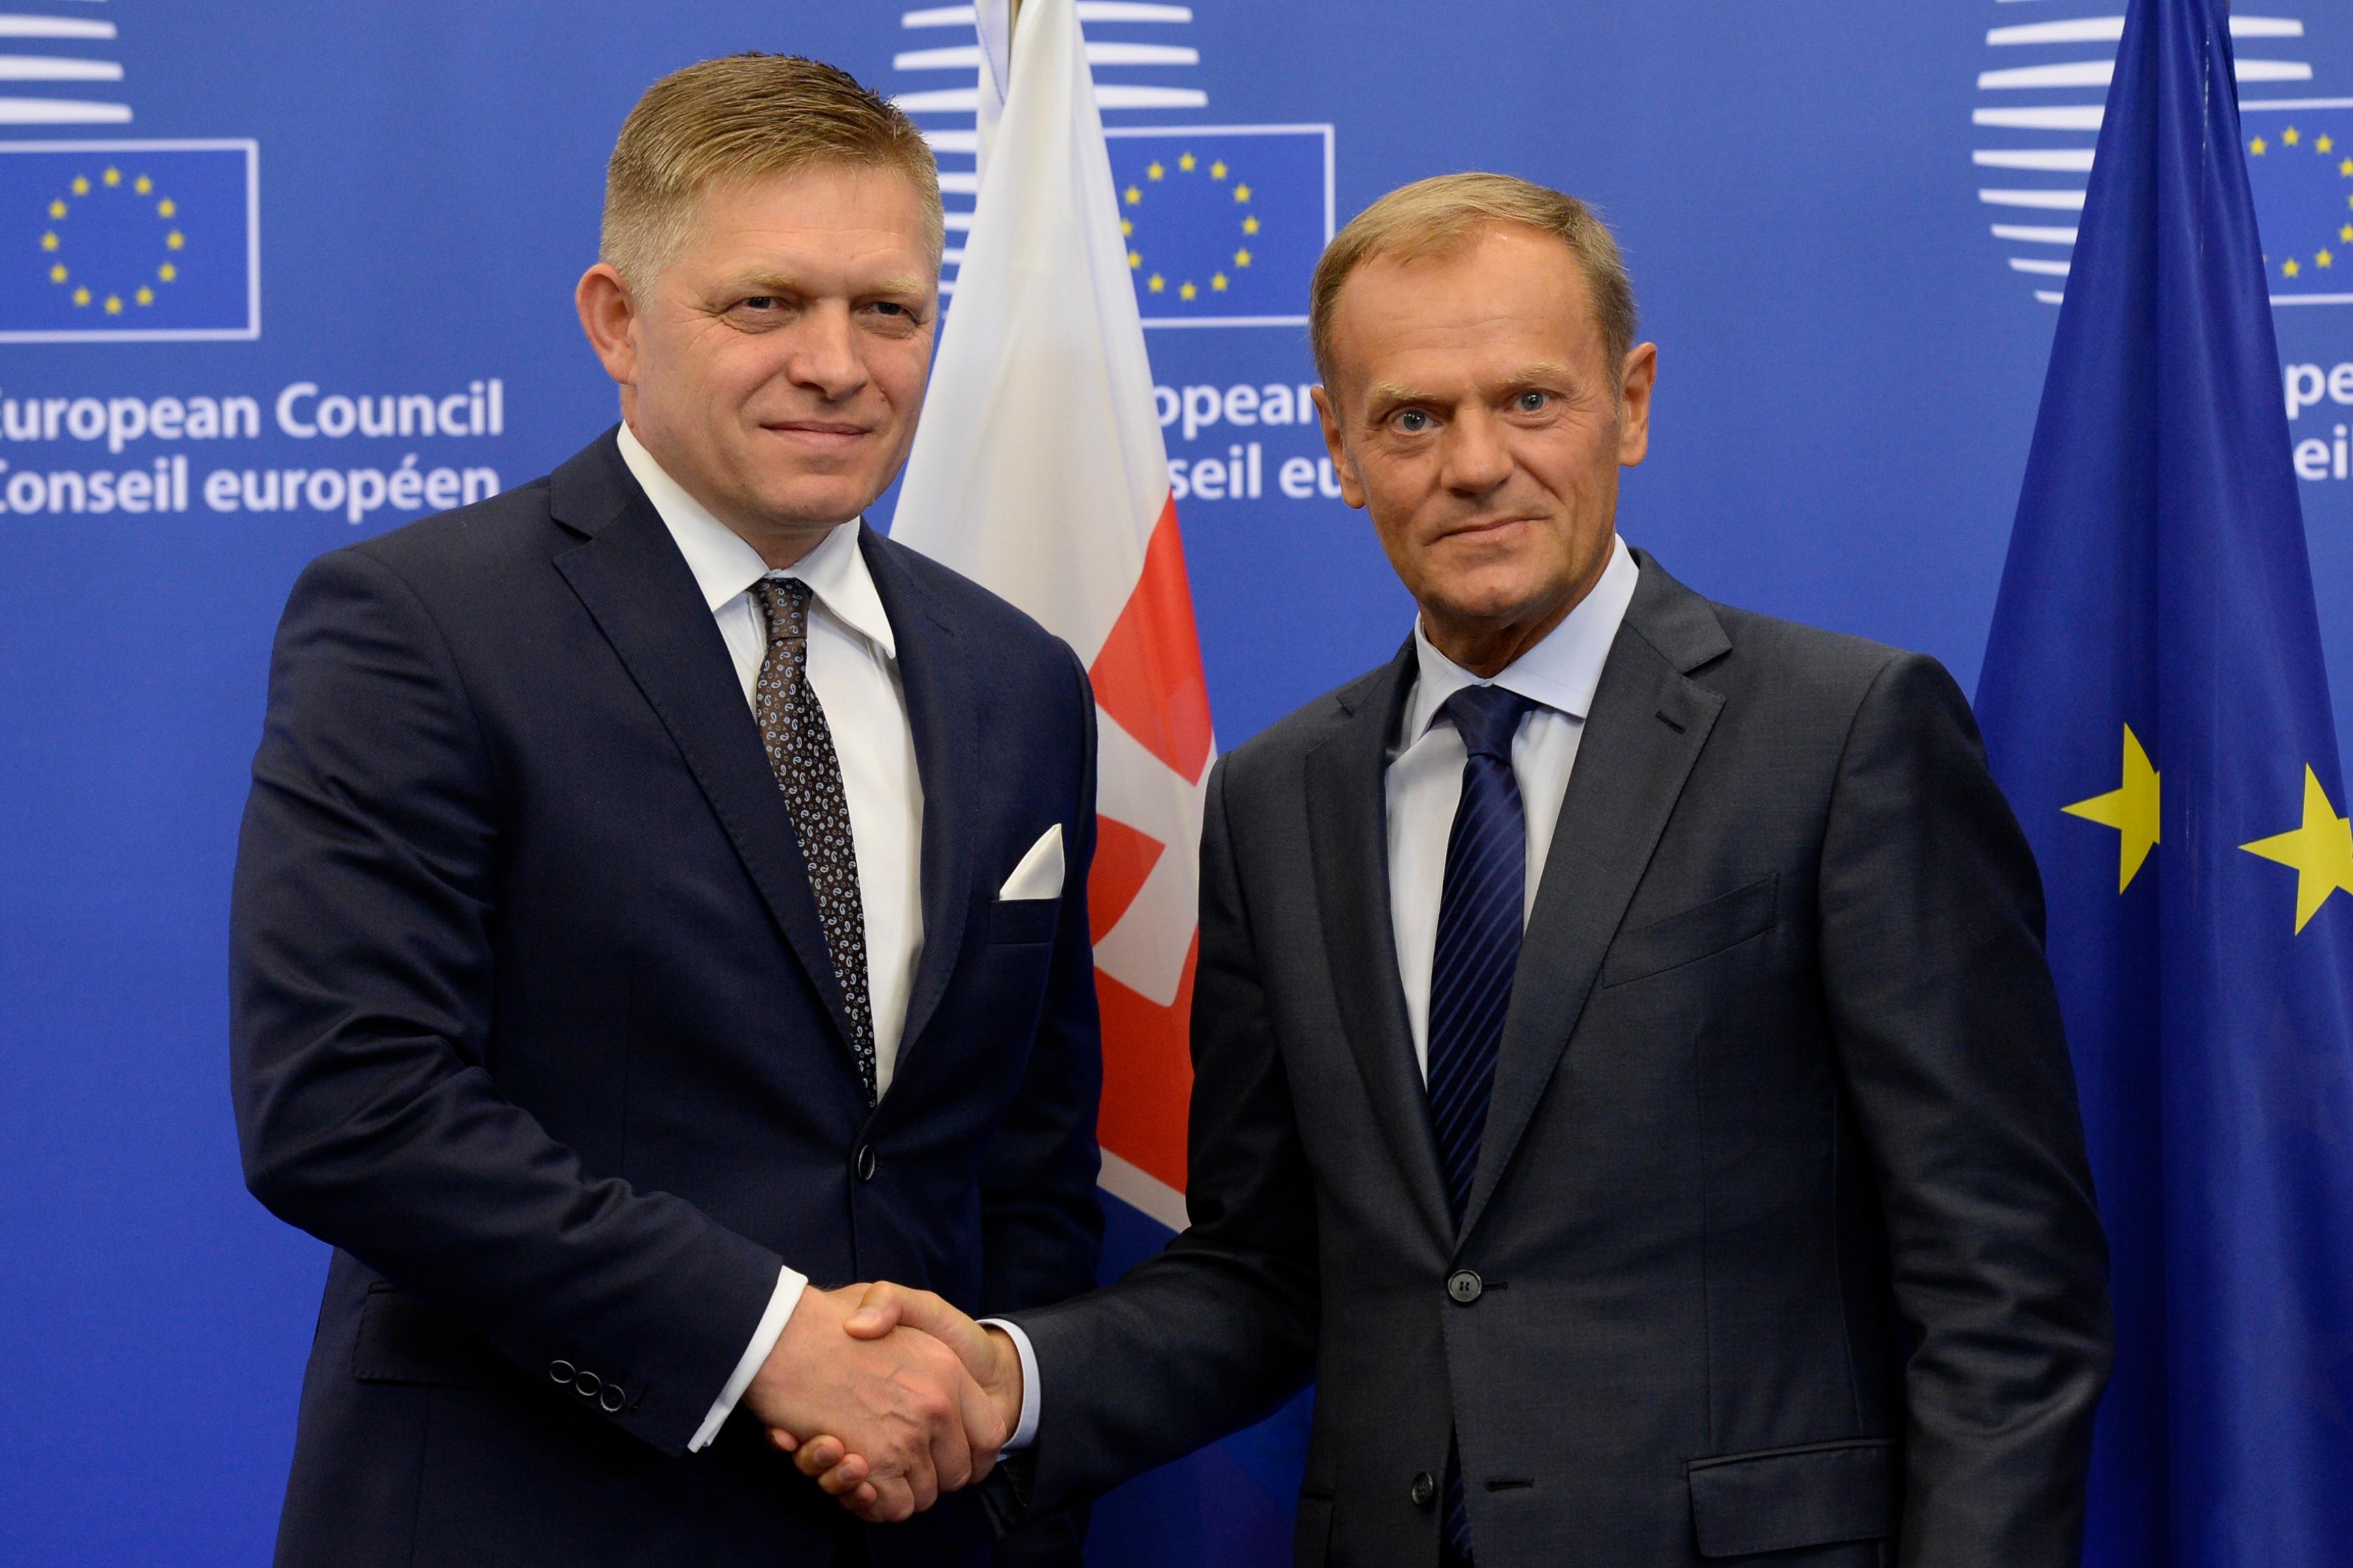 Bratislavský summit, Brusel, Európska rada